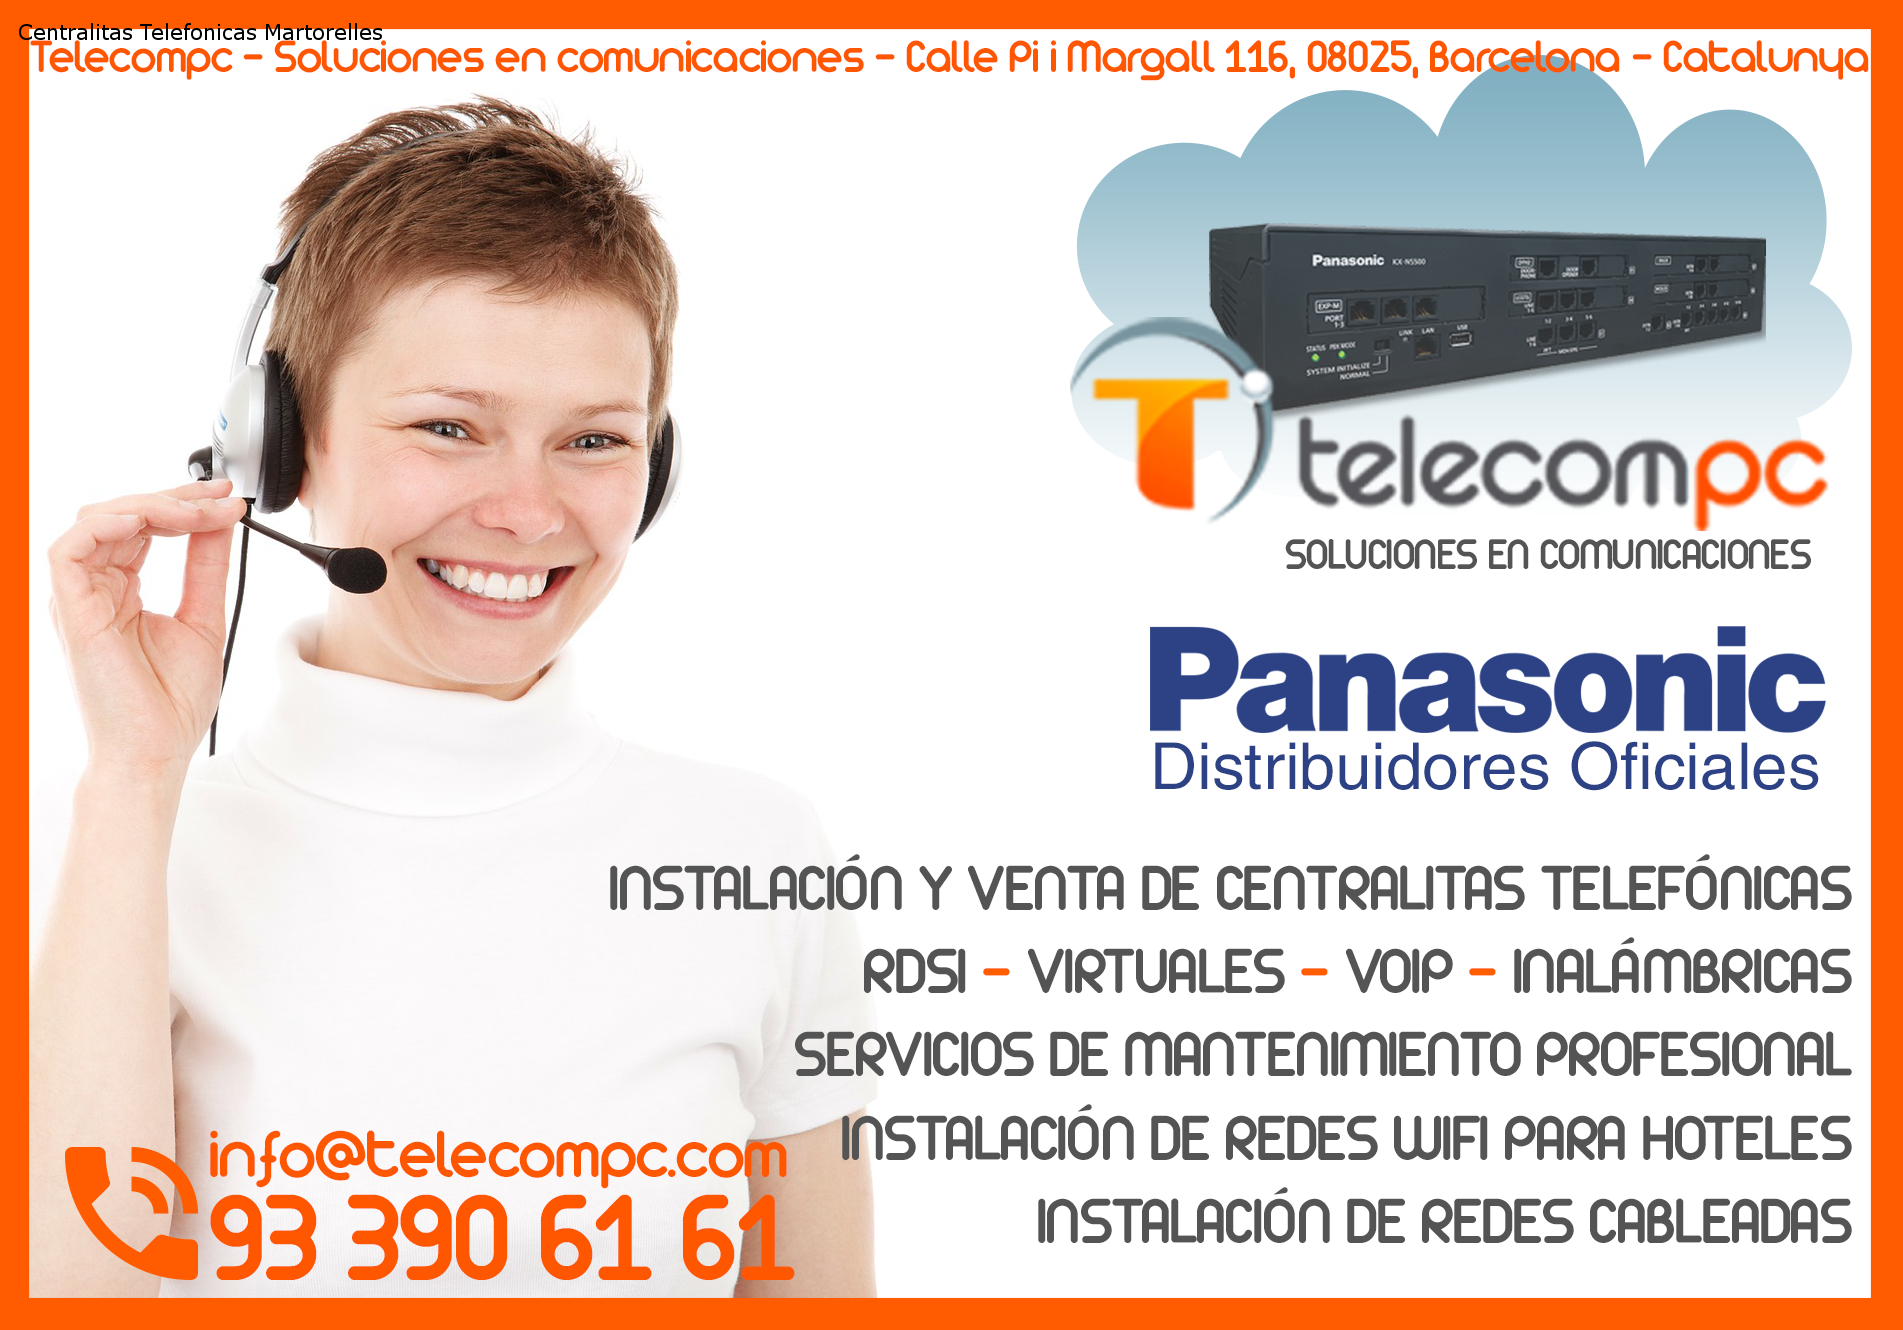 Centralitas Telefonicas Martorelles